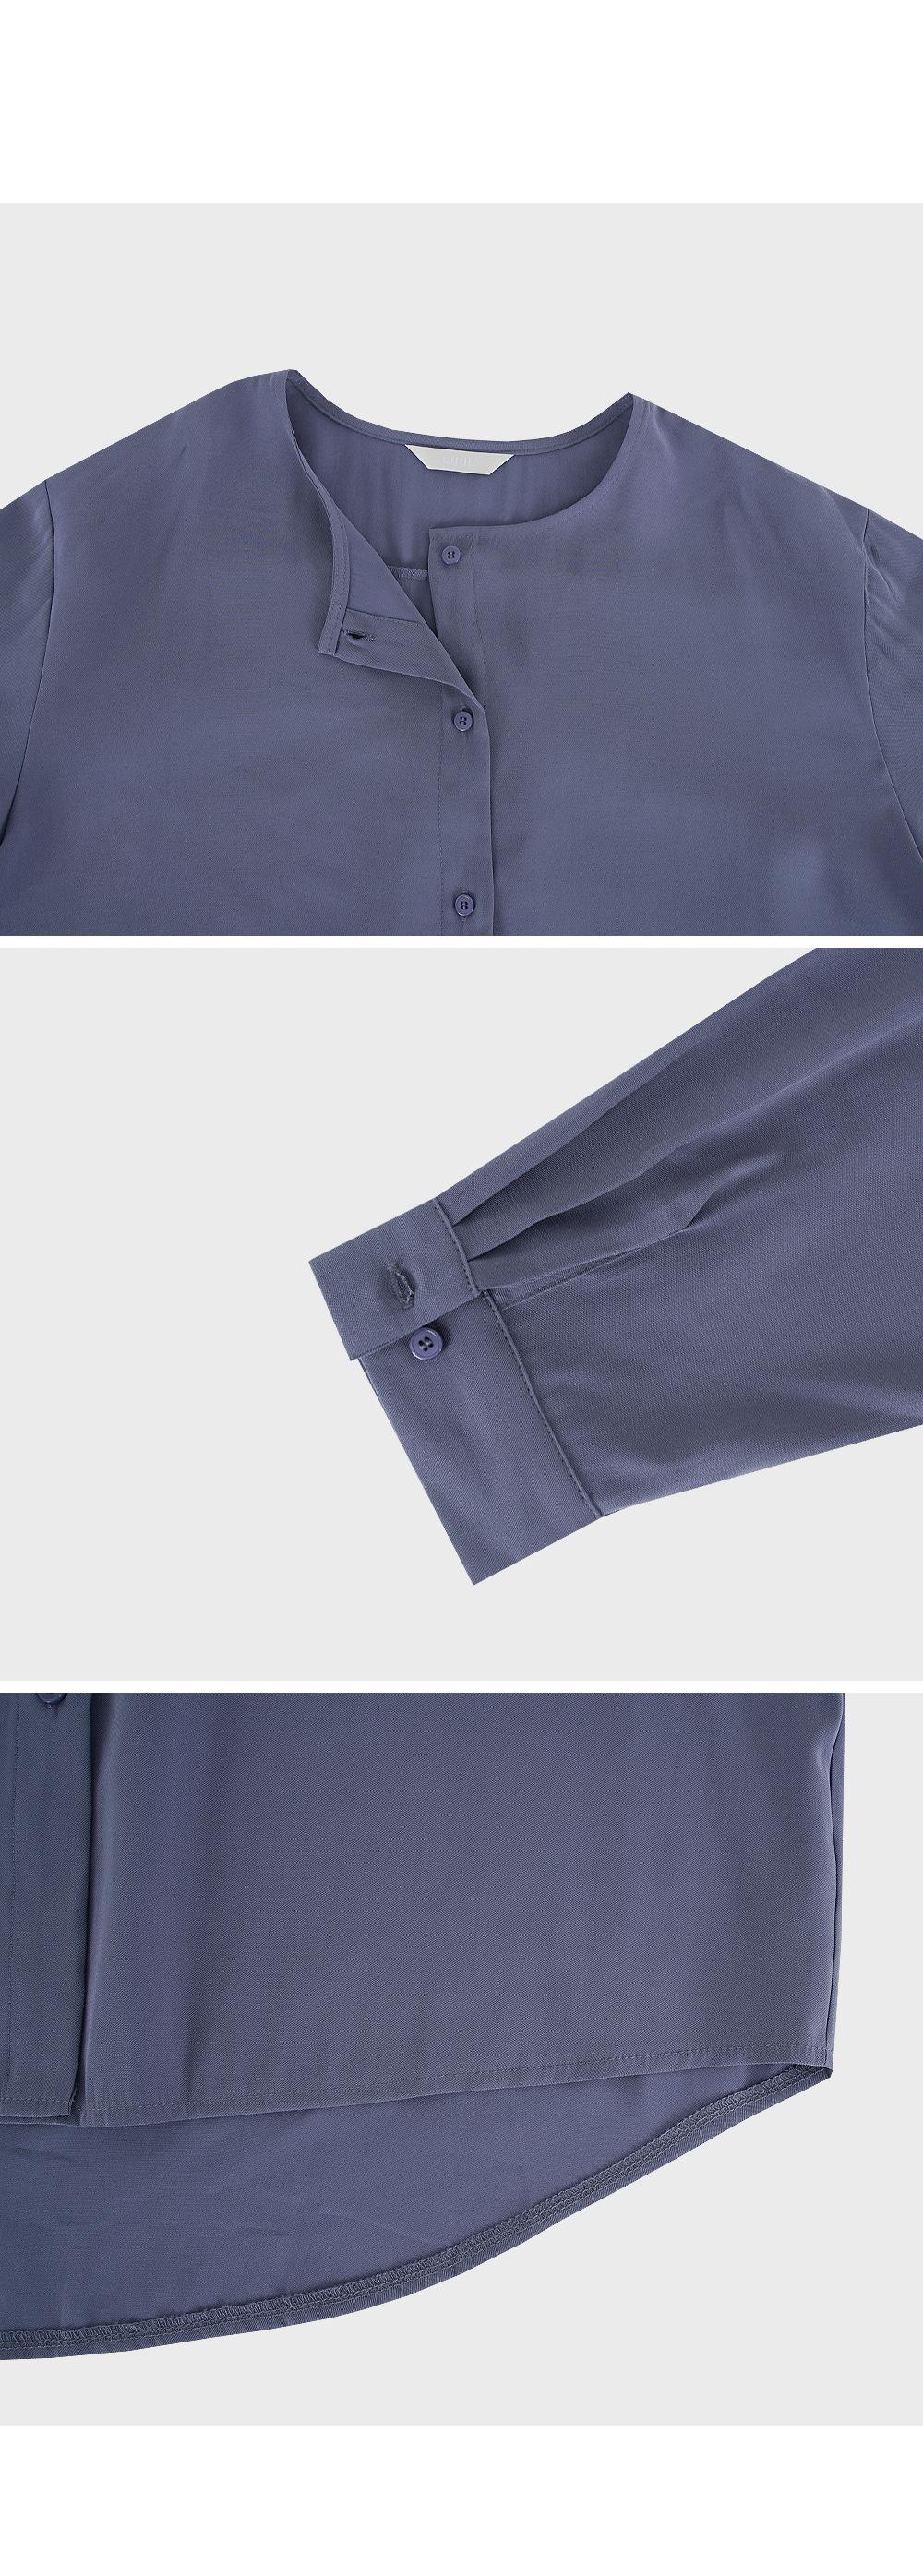 Round Neck Button Up Blouse-Holiholic